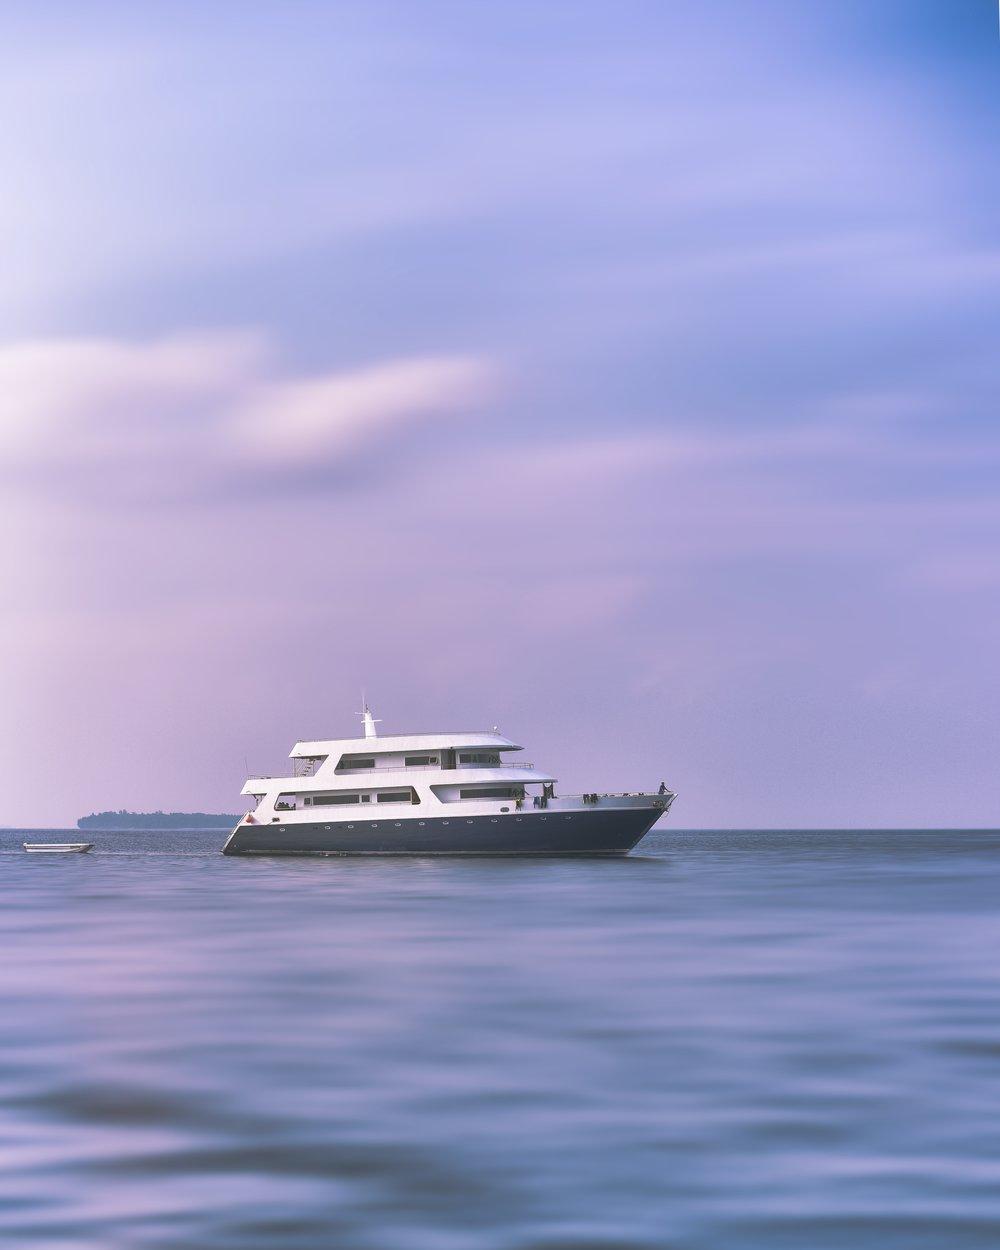 yacht saffu-262382-unsplash.jpg